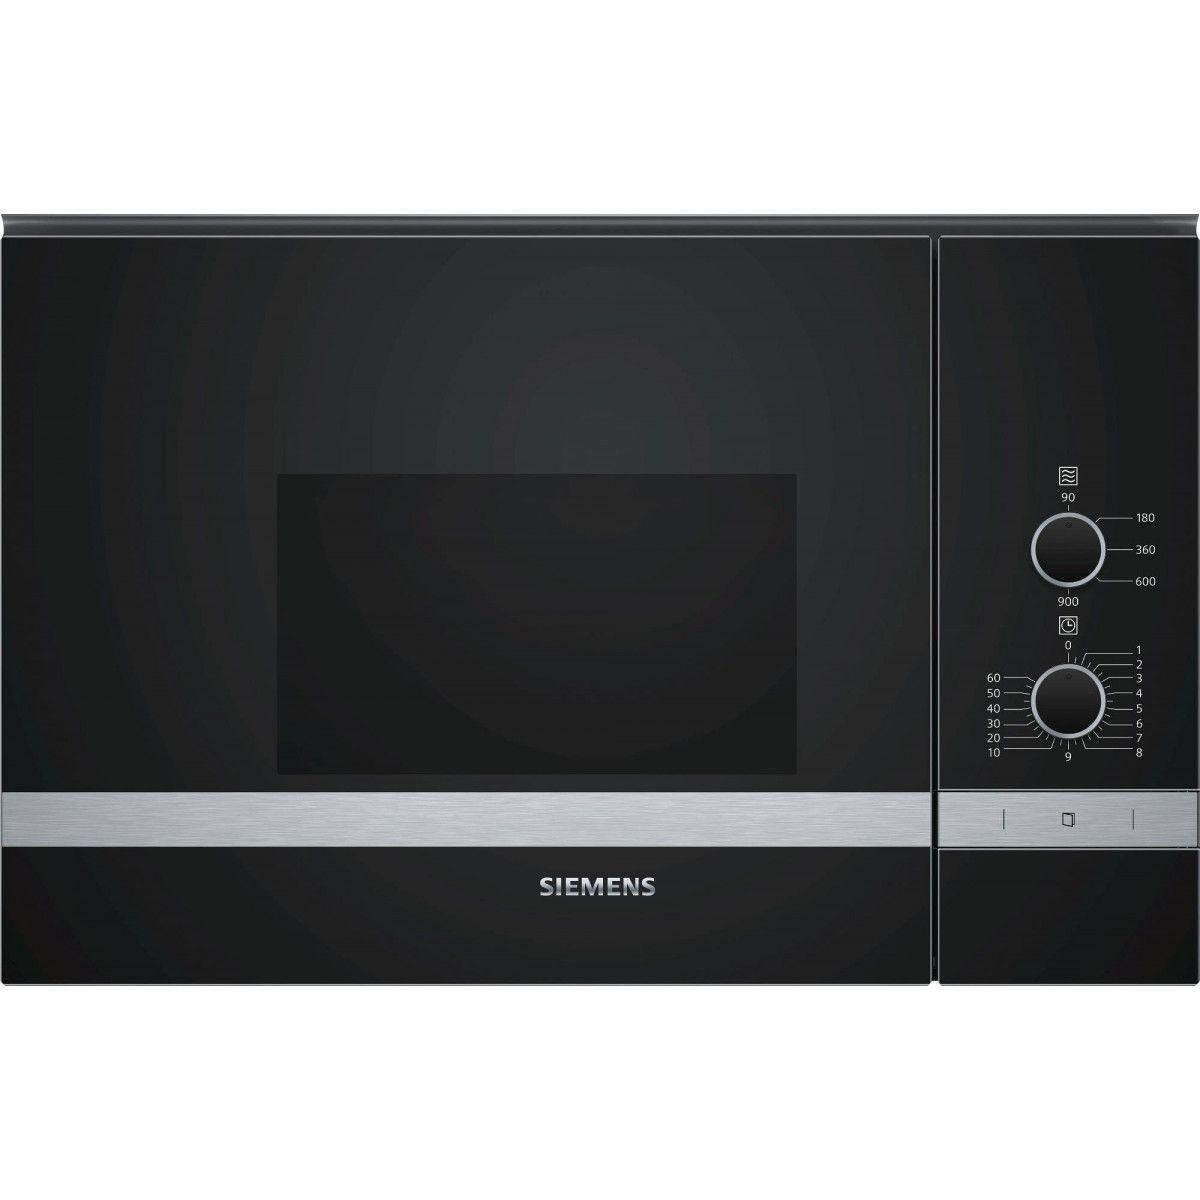 Siemens Micro-ondes Encastrable 25l Siemens 900w 59.4cm, Bf 550 Lmr 0